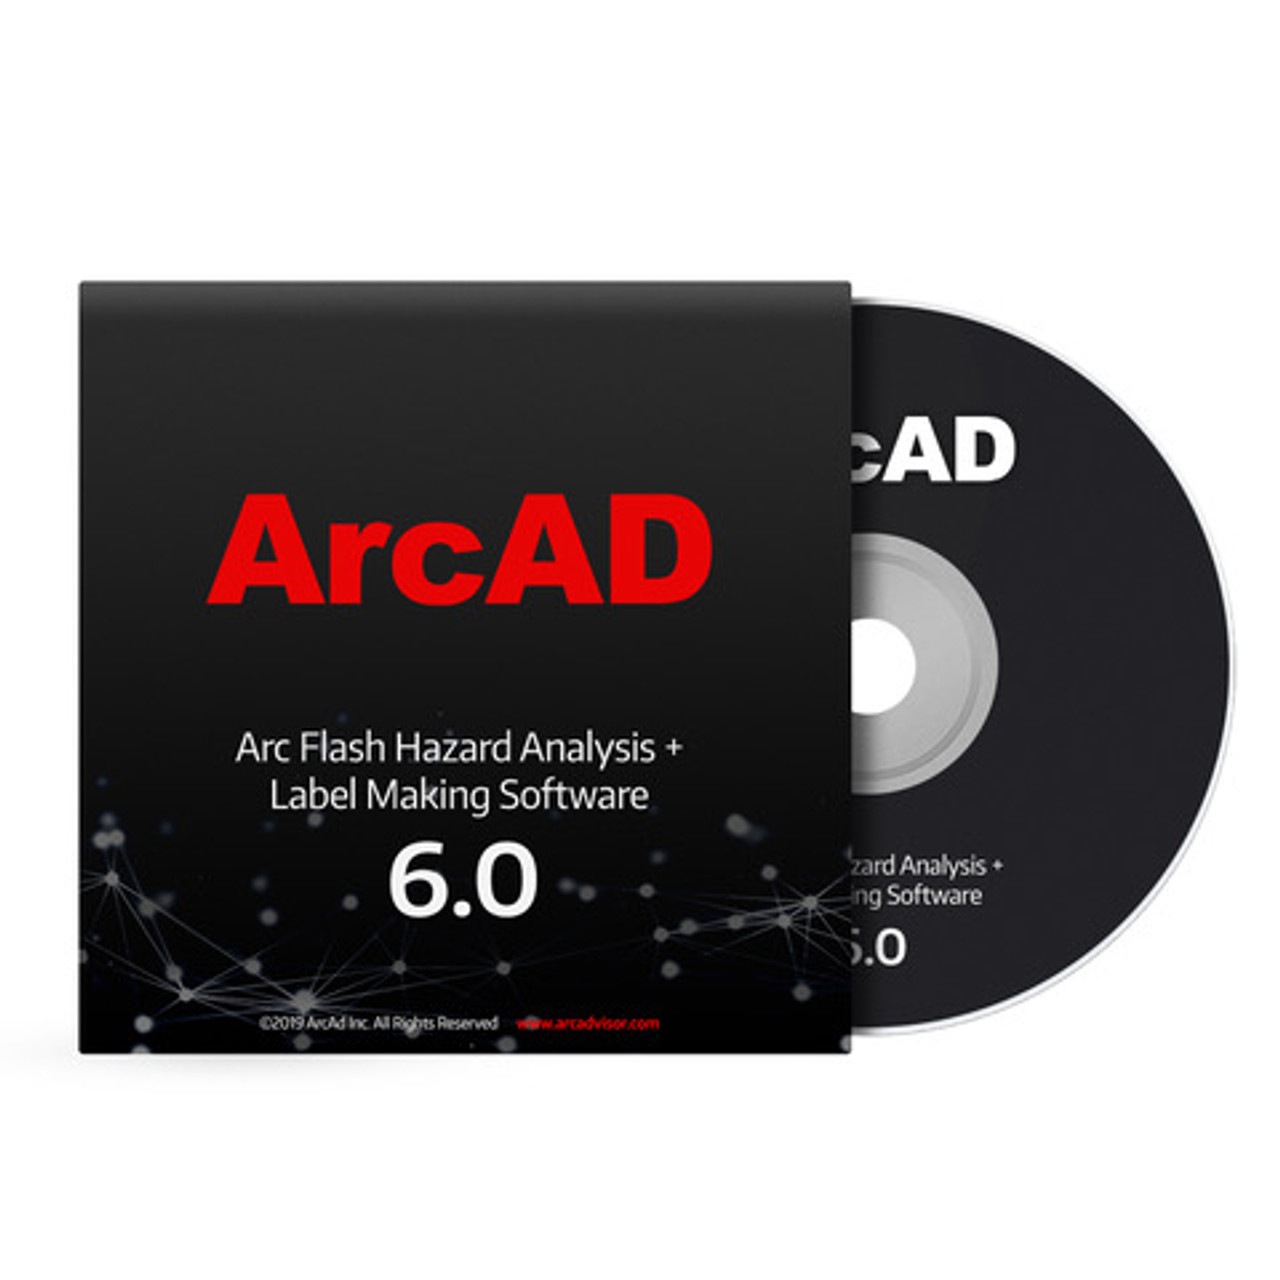 Arc Flash Hazard Calculator V6.0 on